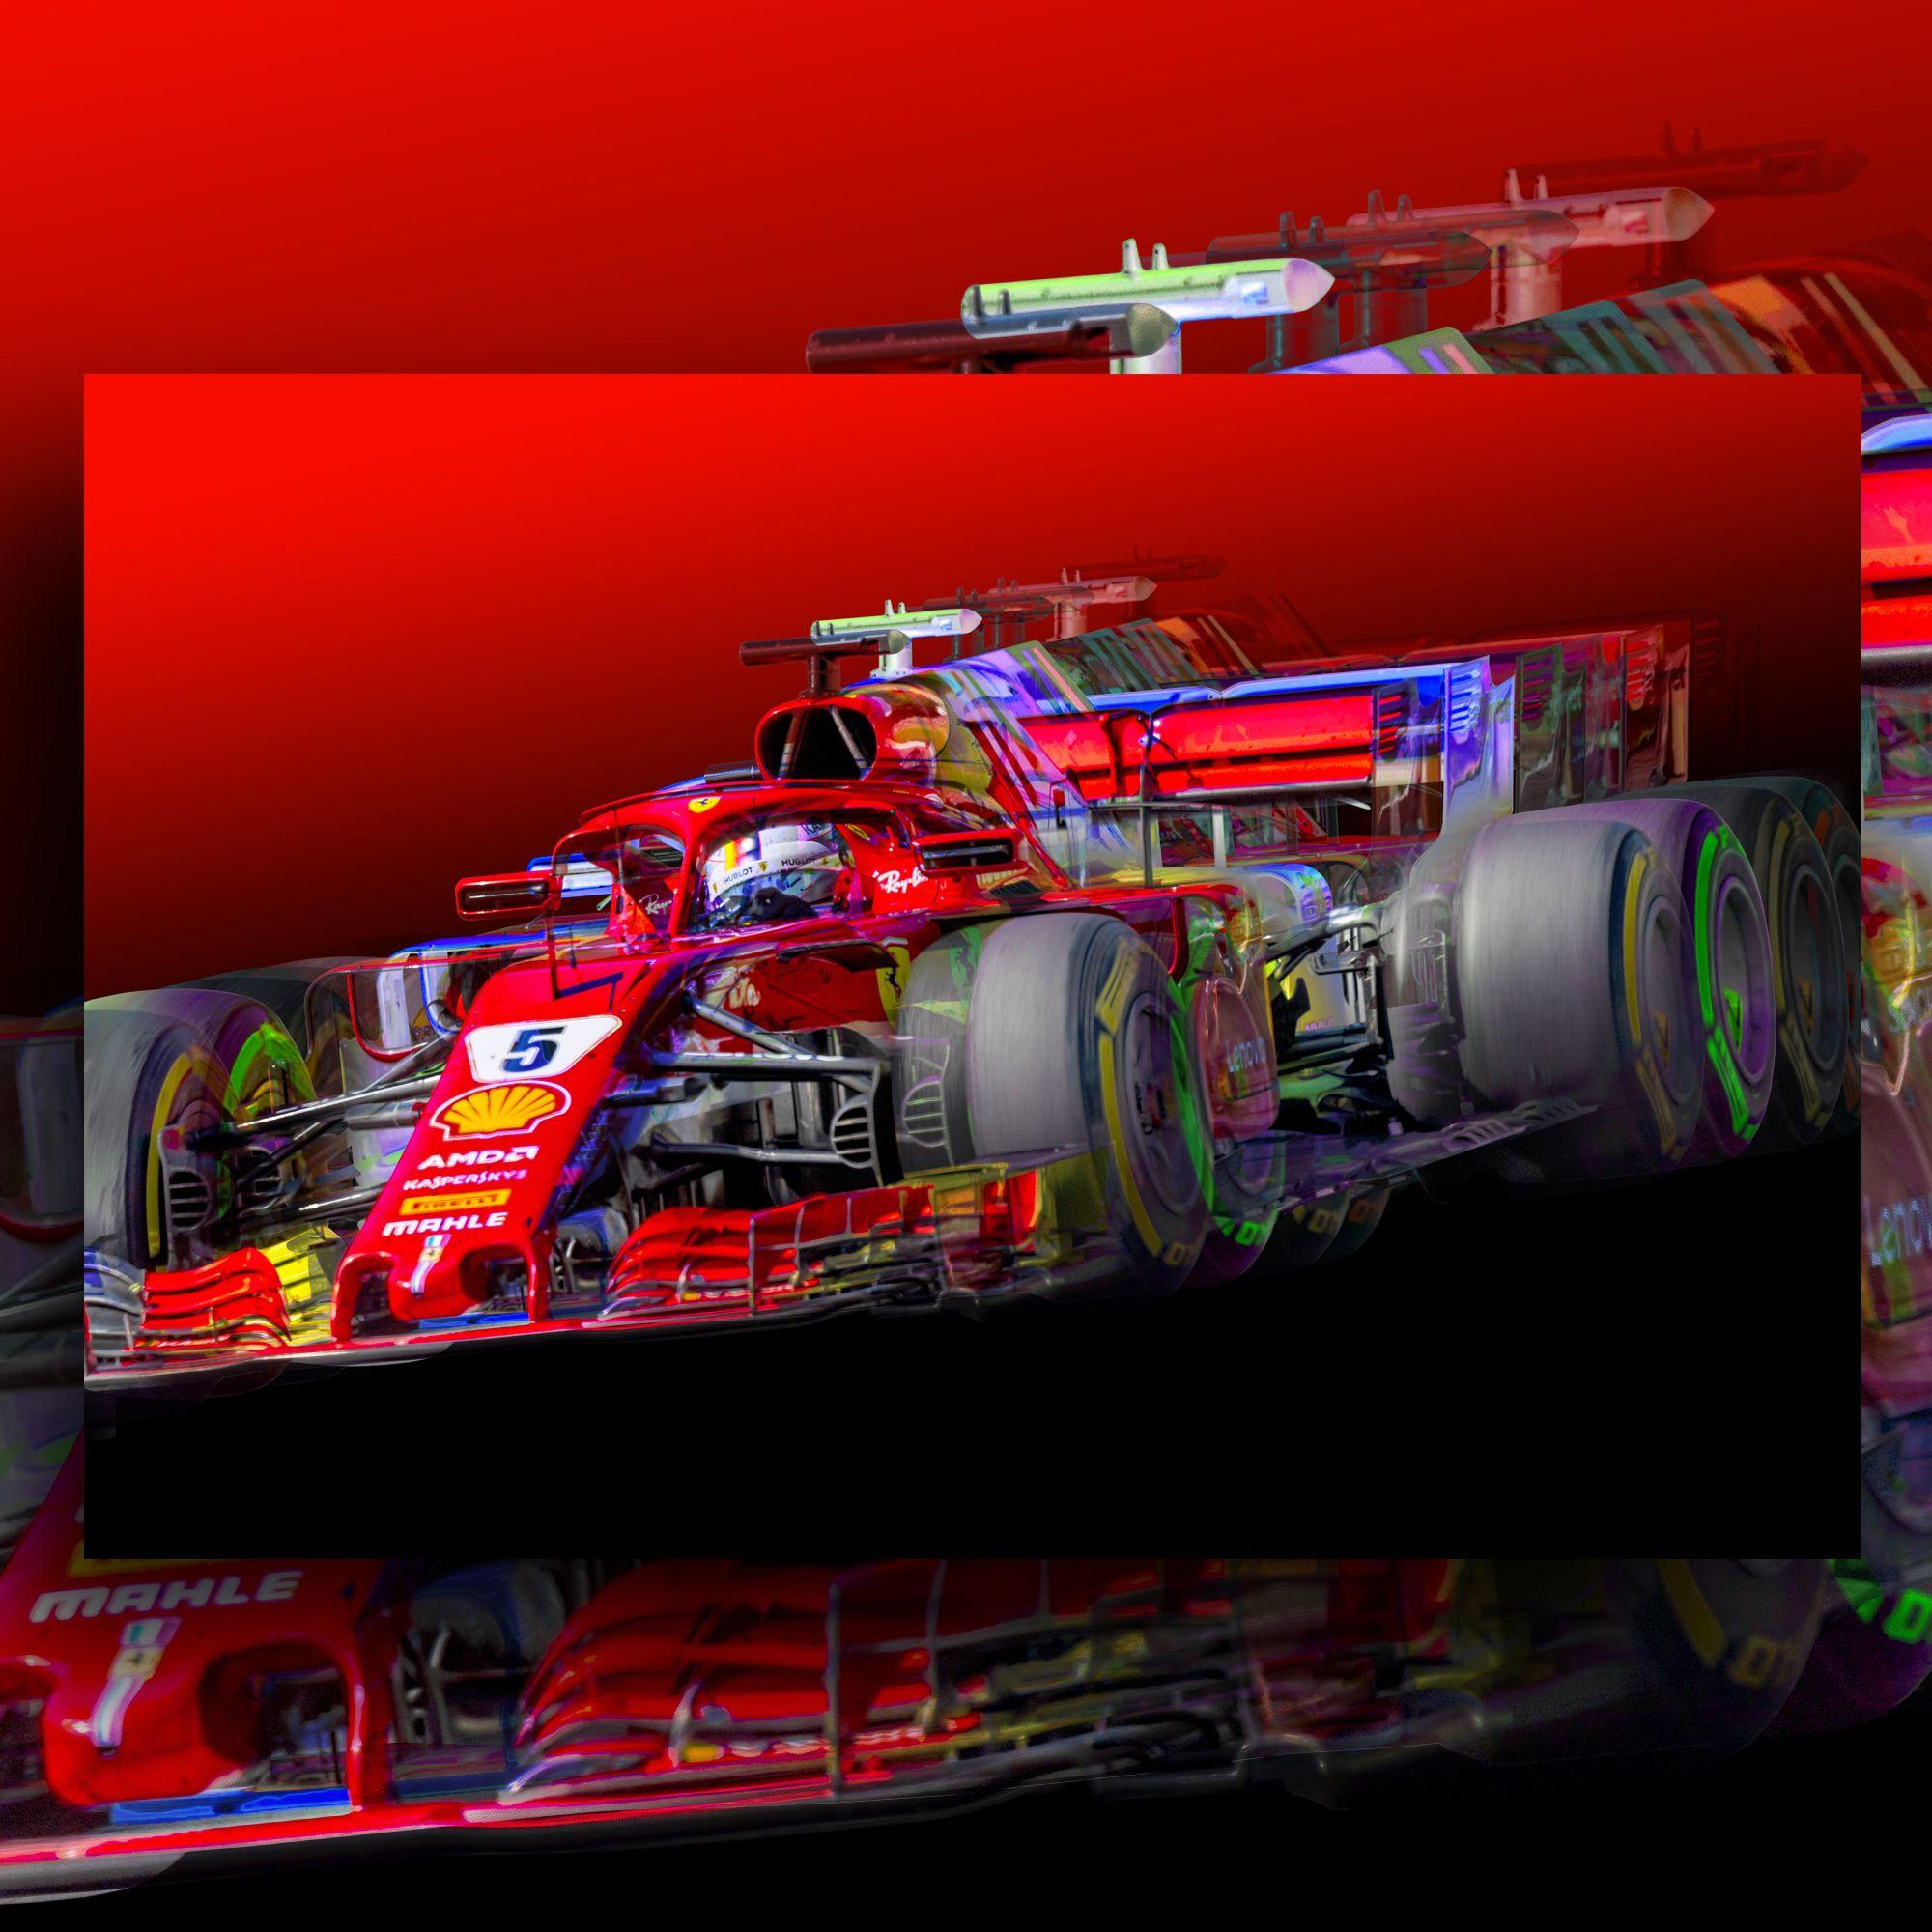 Formula1 Canvas Sebastian Vettel F1 Canvas The Gpbox Racing Art Canvas Modular Wall Art